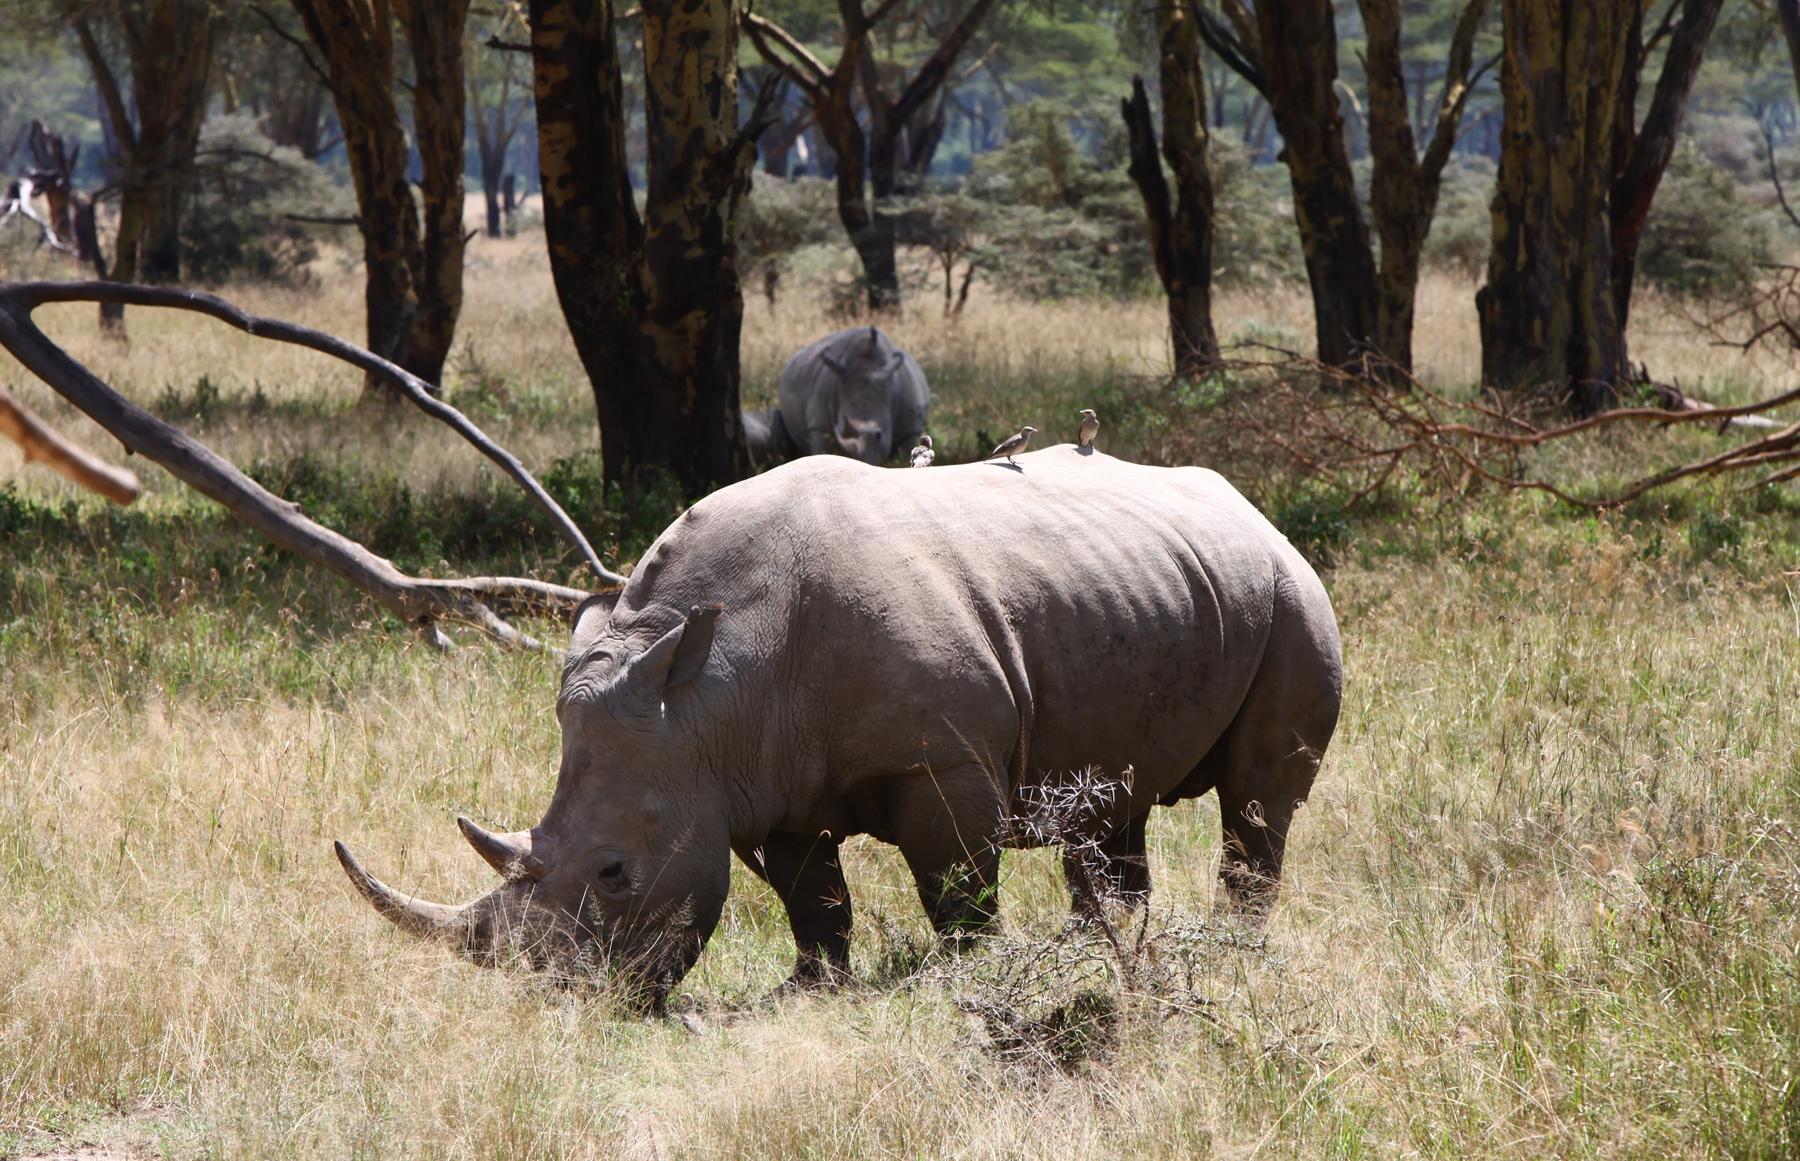 Wallpaper : trees, forest, grass, wildlife, rhino, Safari